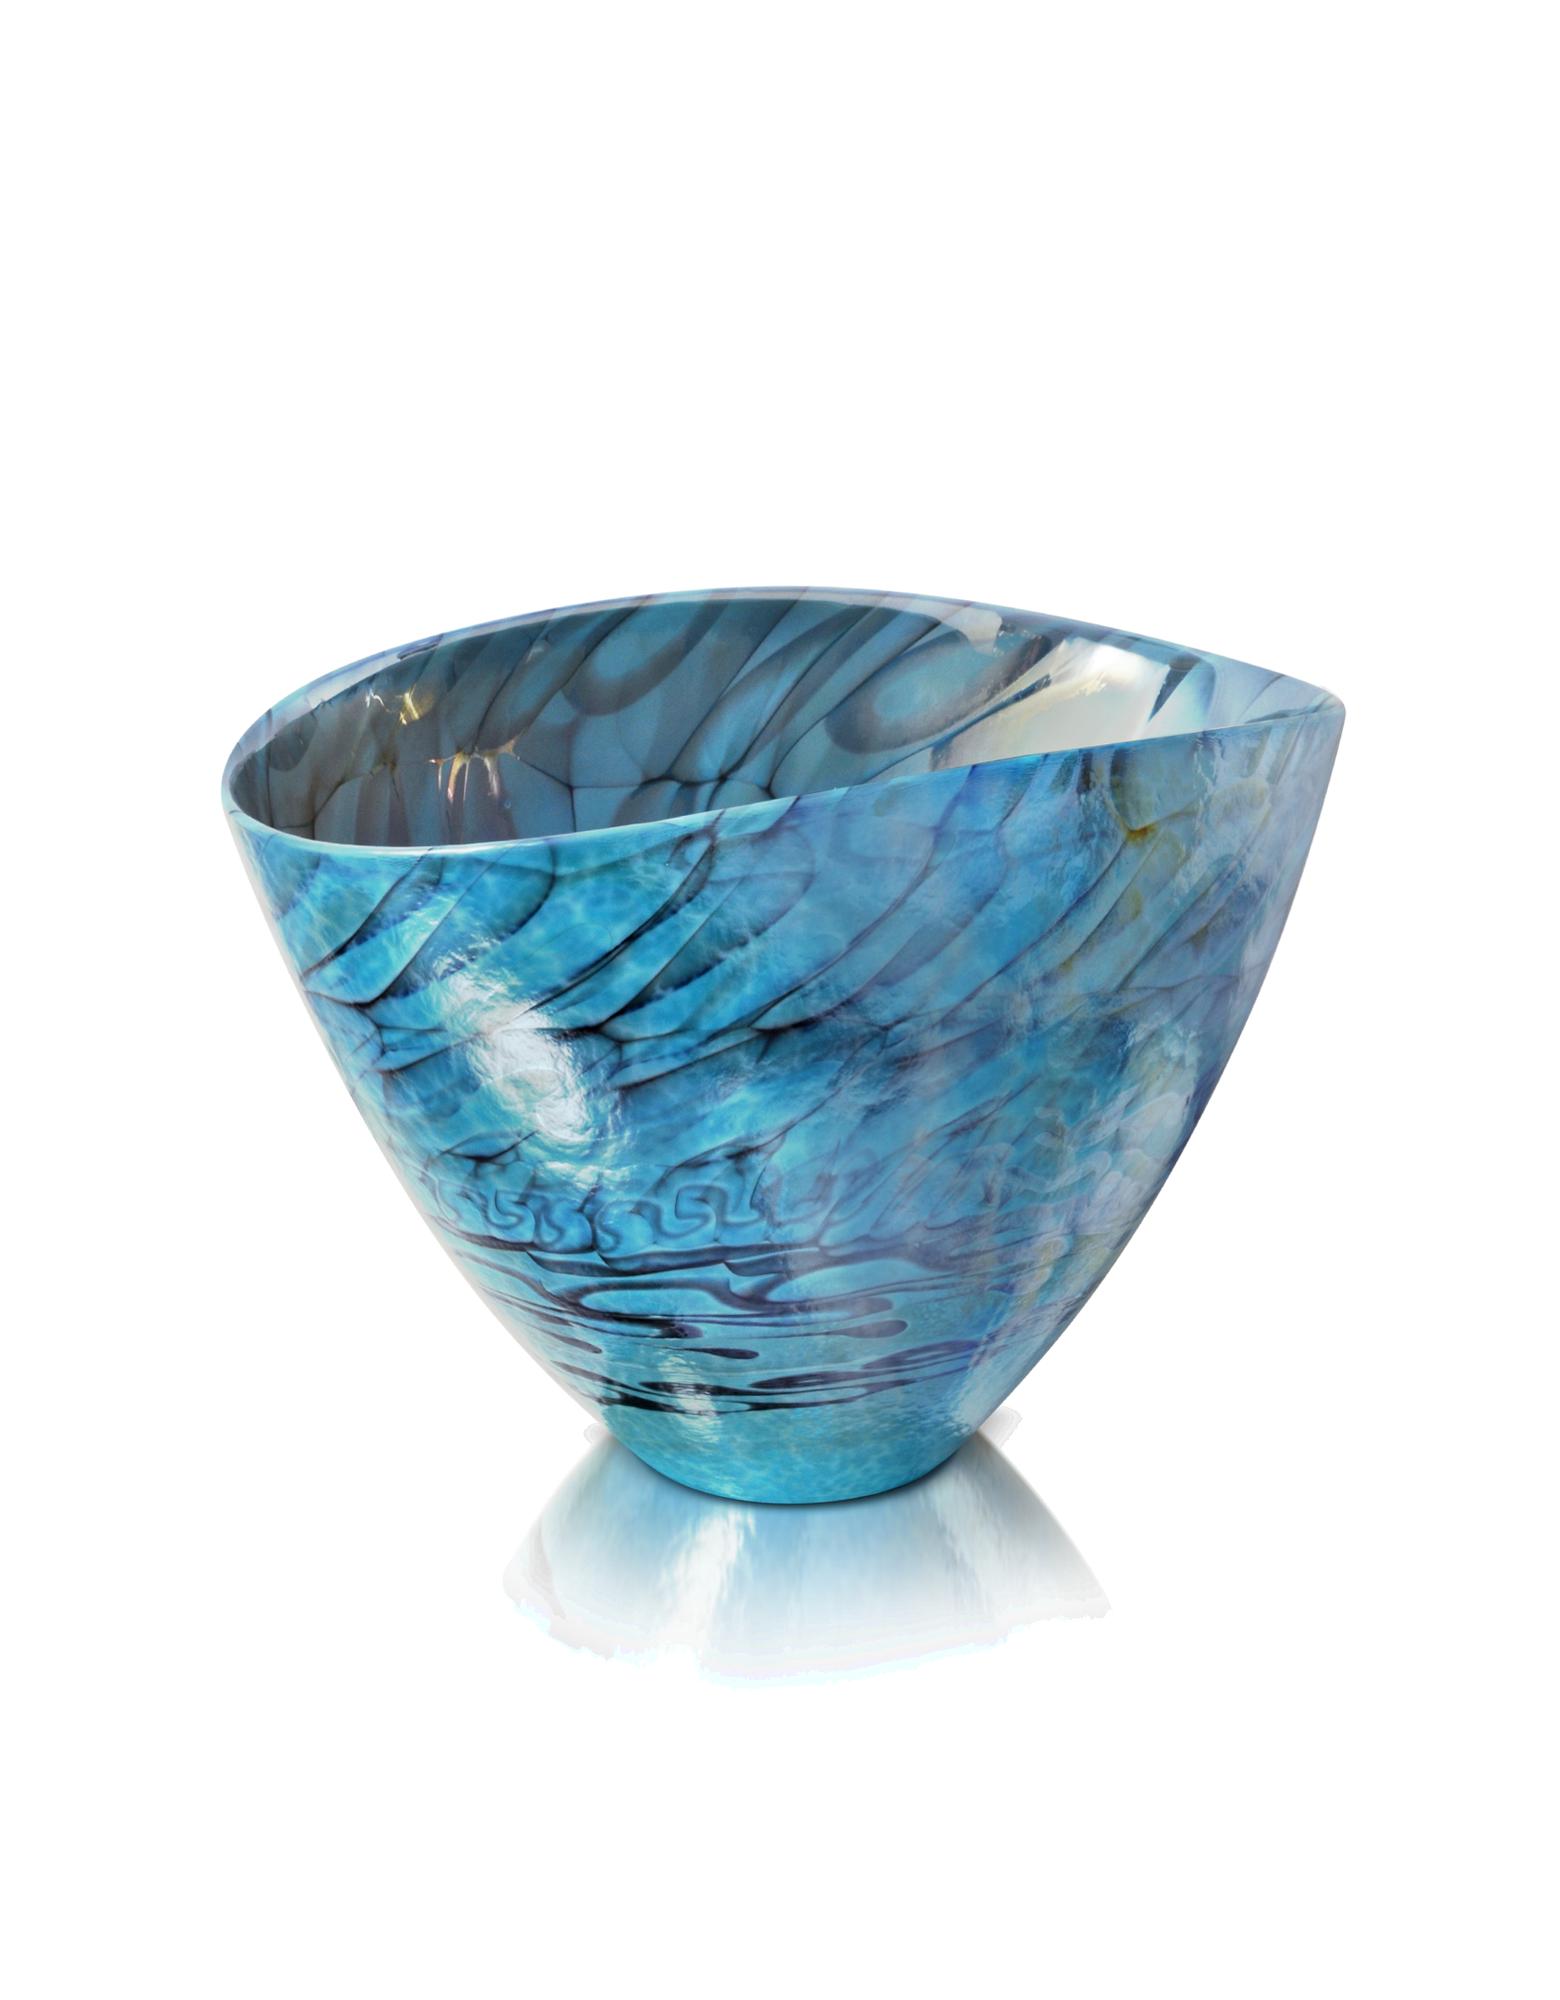 Image of Belus - Turquoise Murano Glass Vase